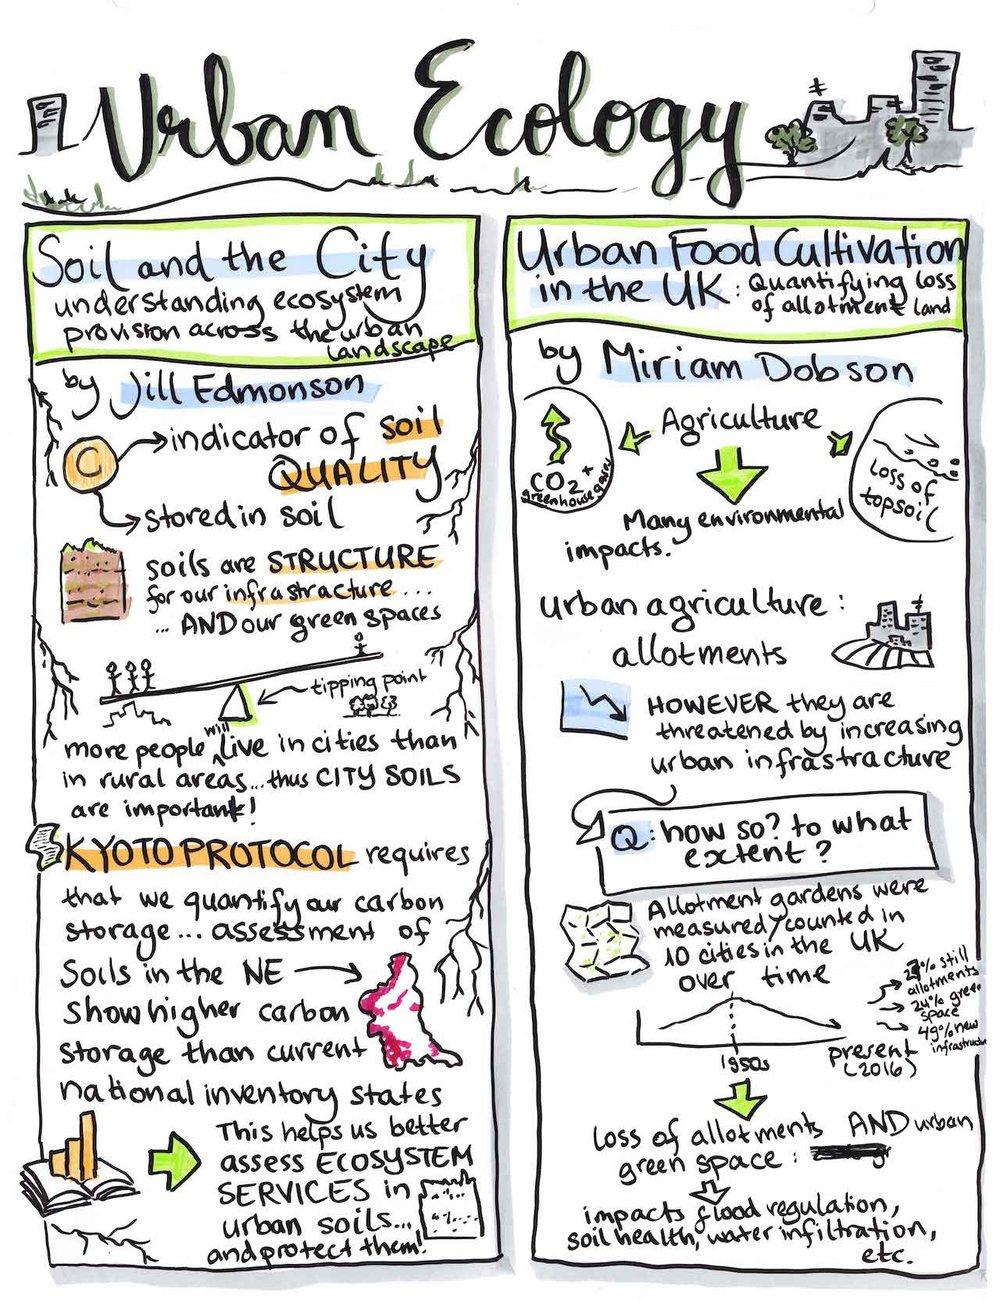 session_urban-ecology1.jpg